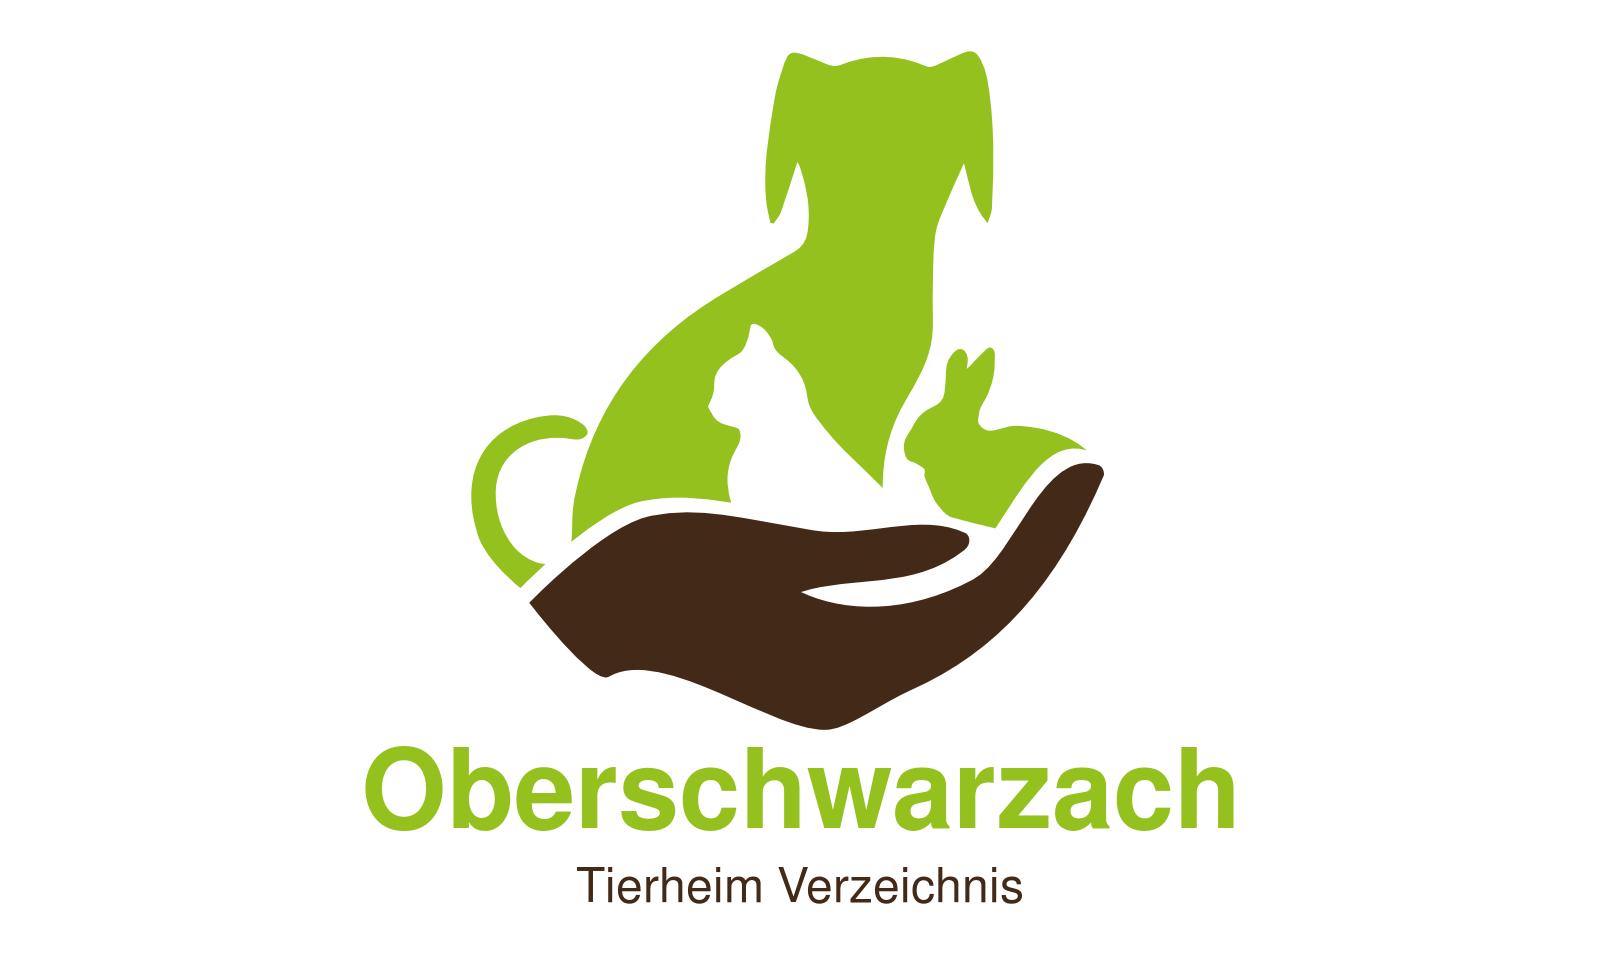 Tierheim Oberschwarzach